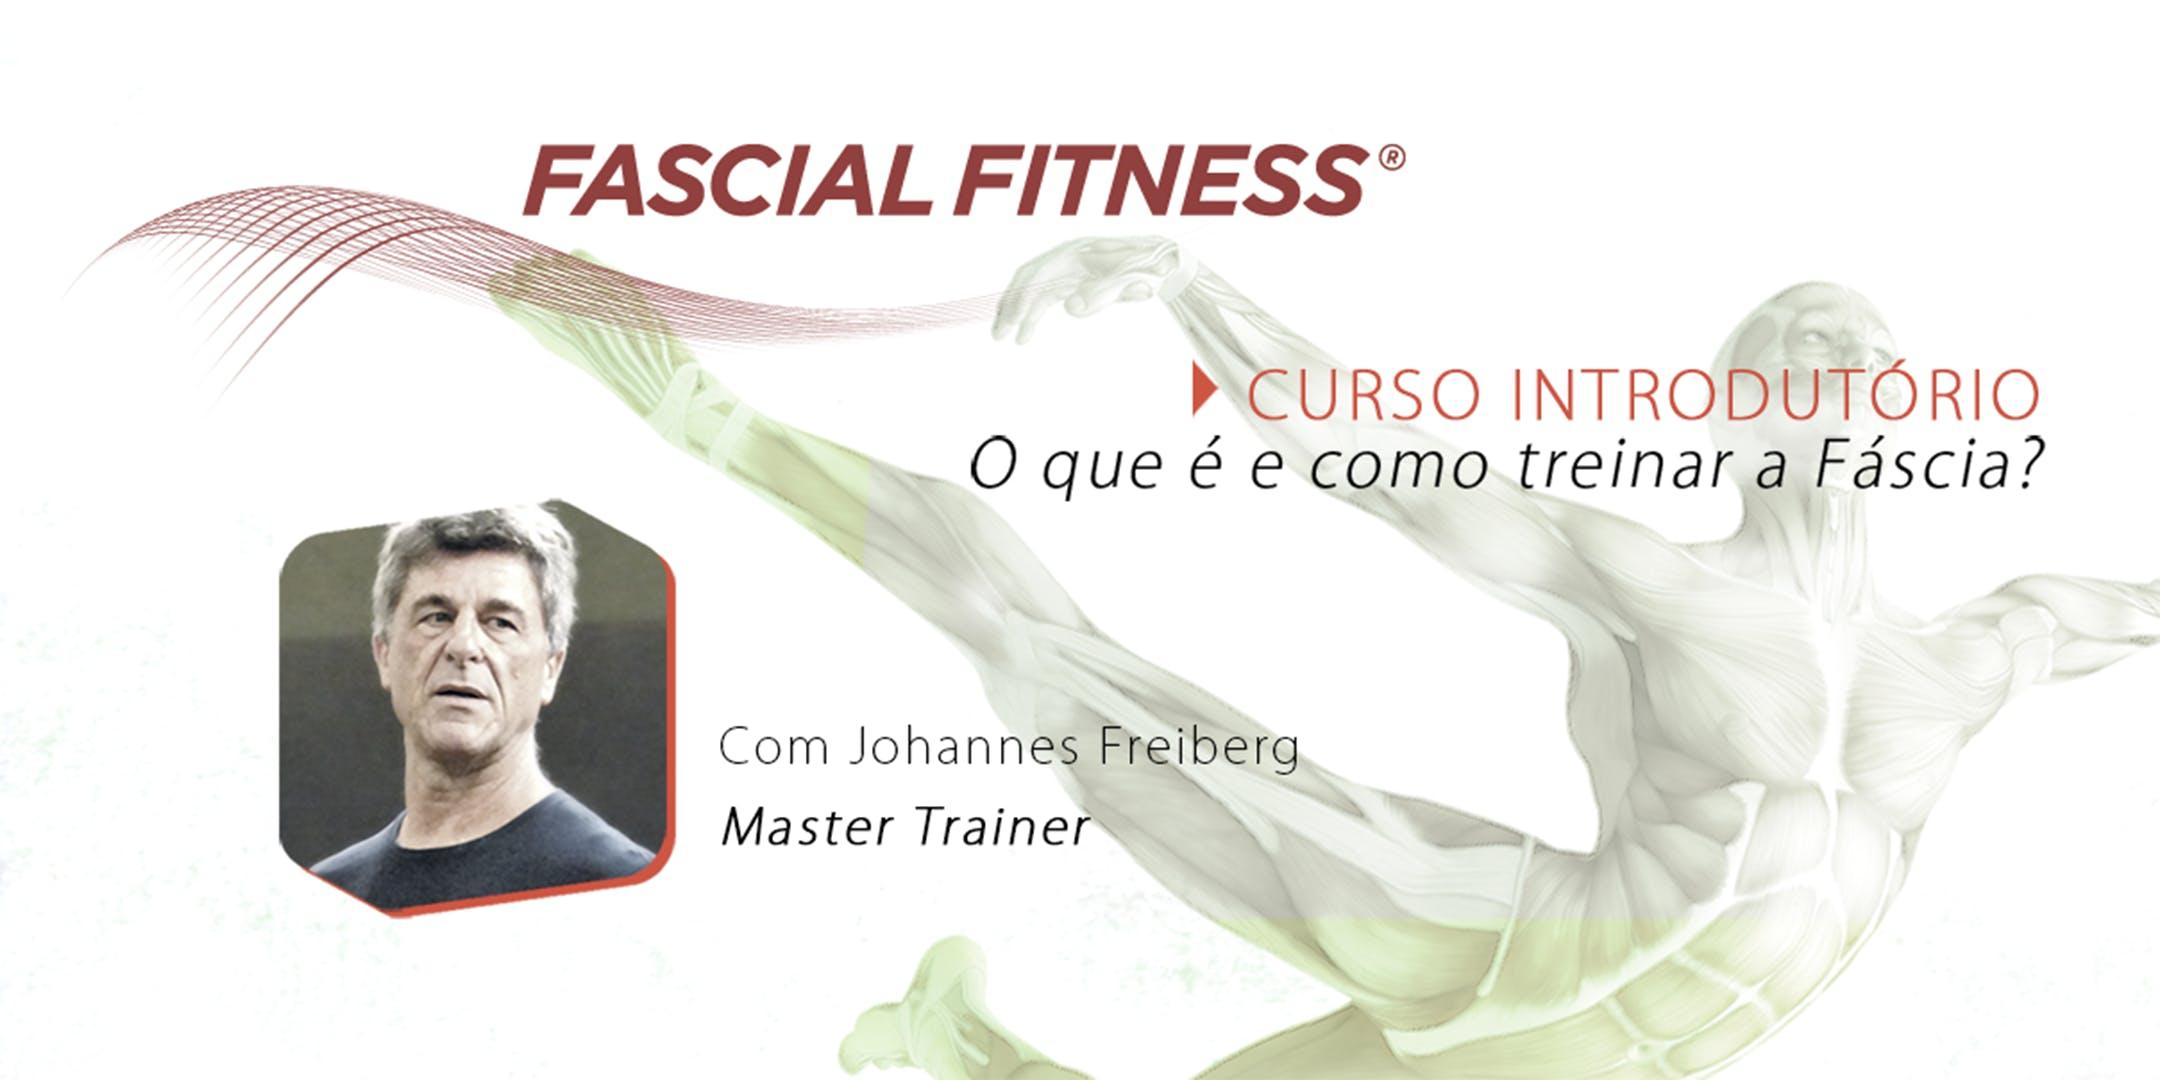 Curso Introdutório Fascial Fitness Maceió (AL